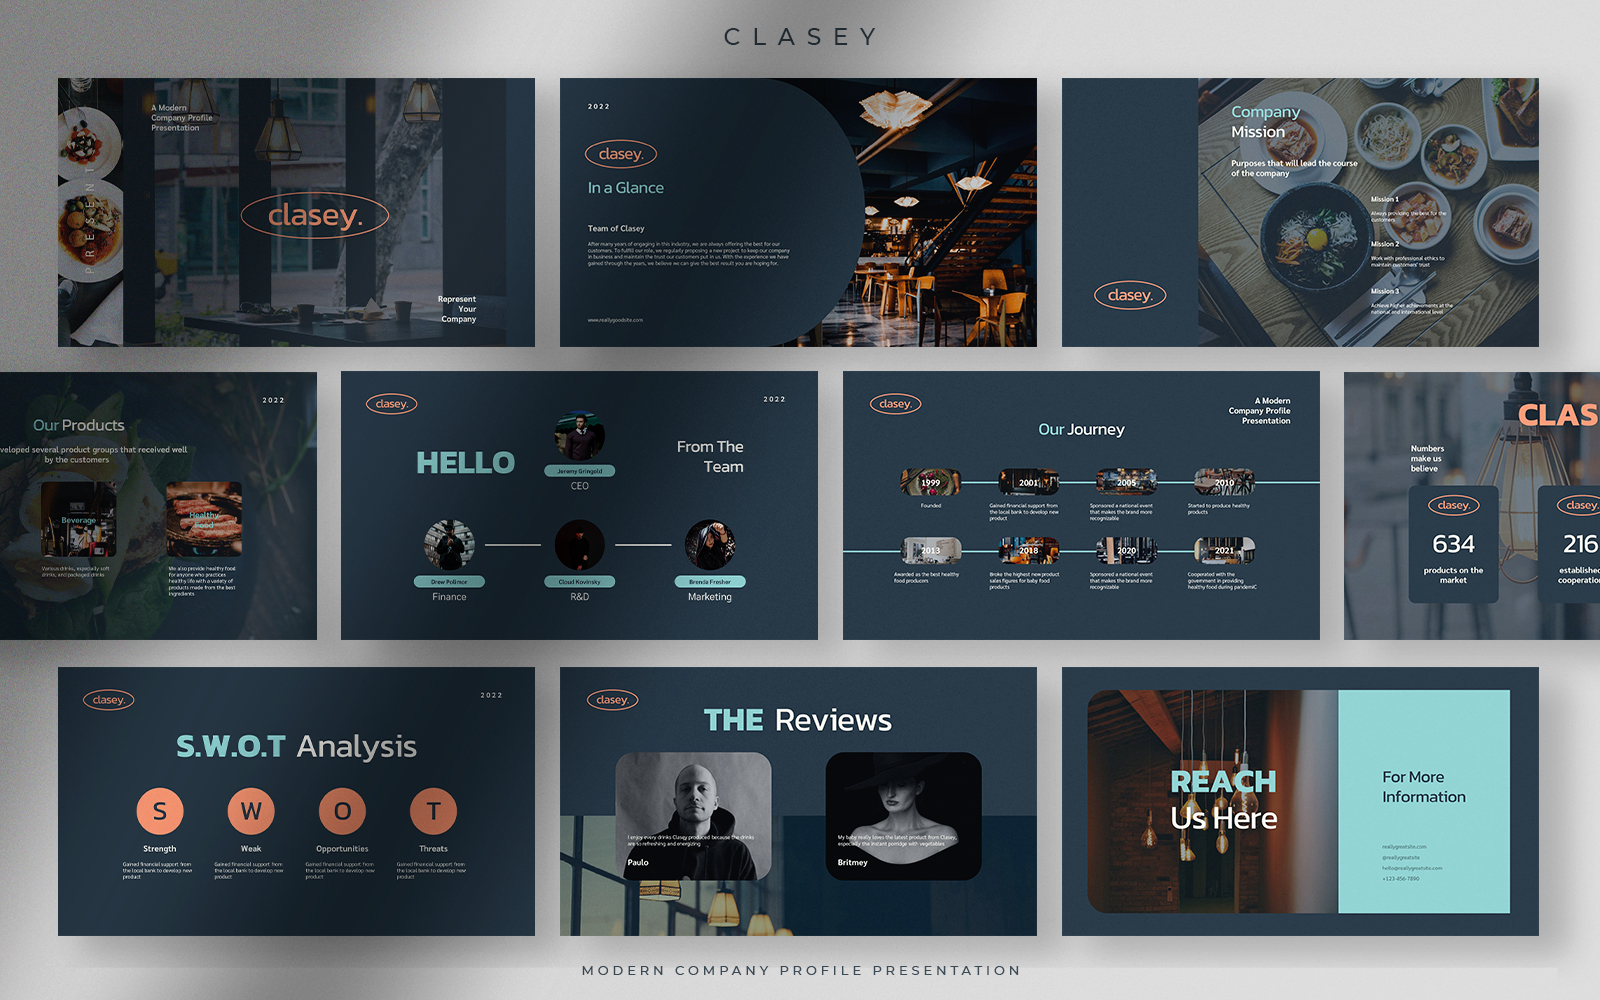 Clasey - Denim Blue Modern Company Profile Presentation